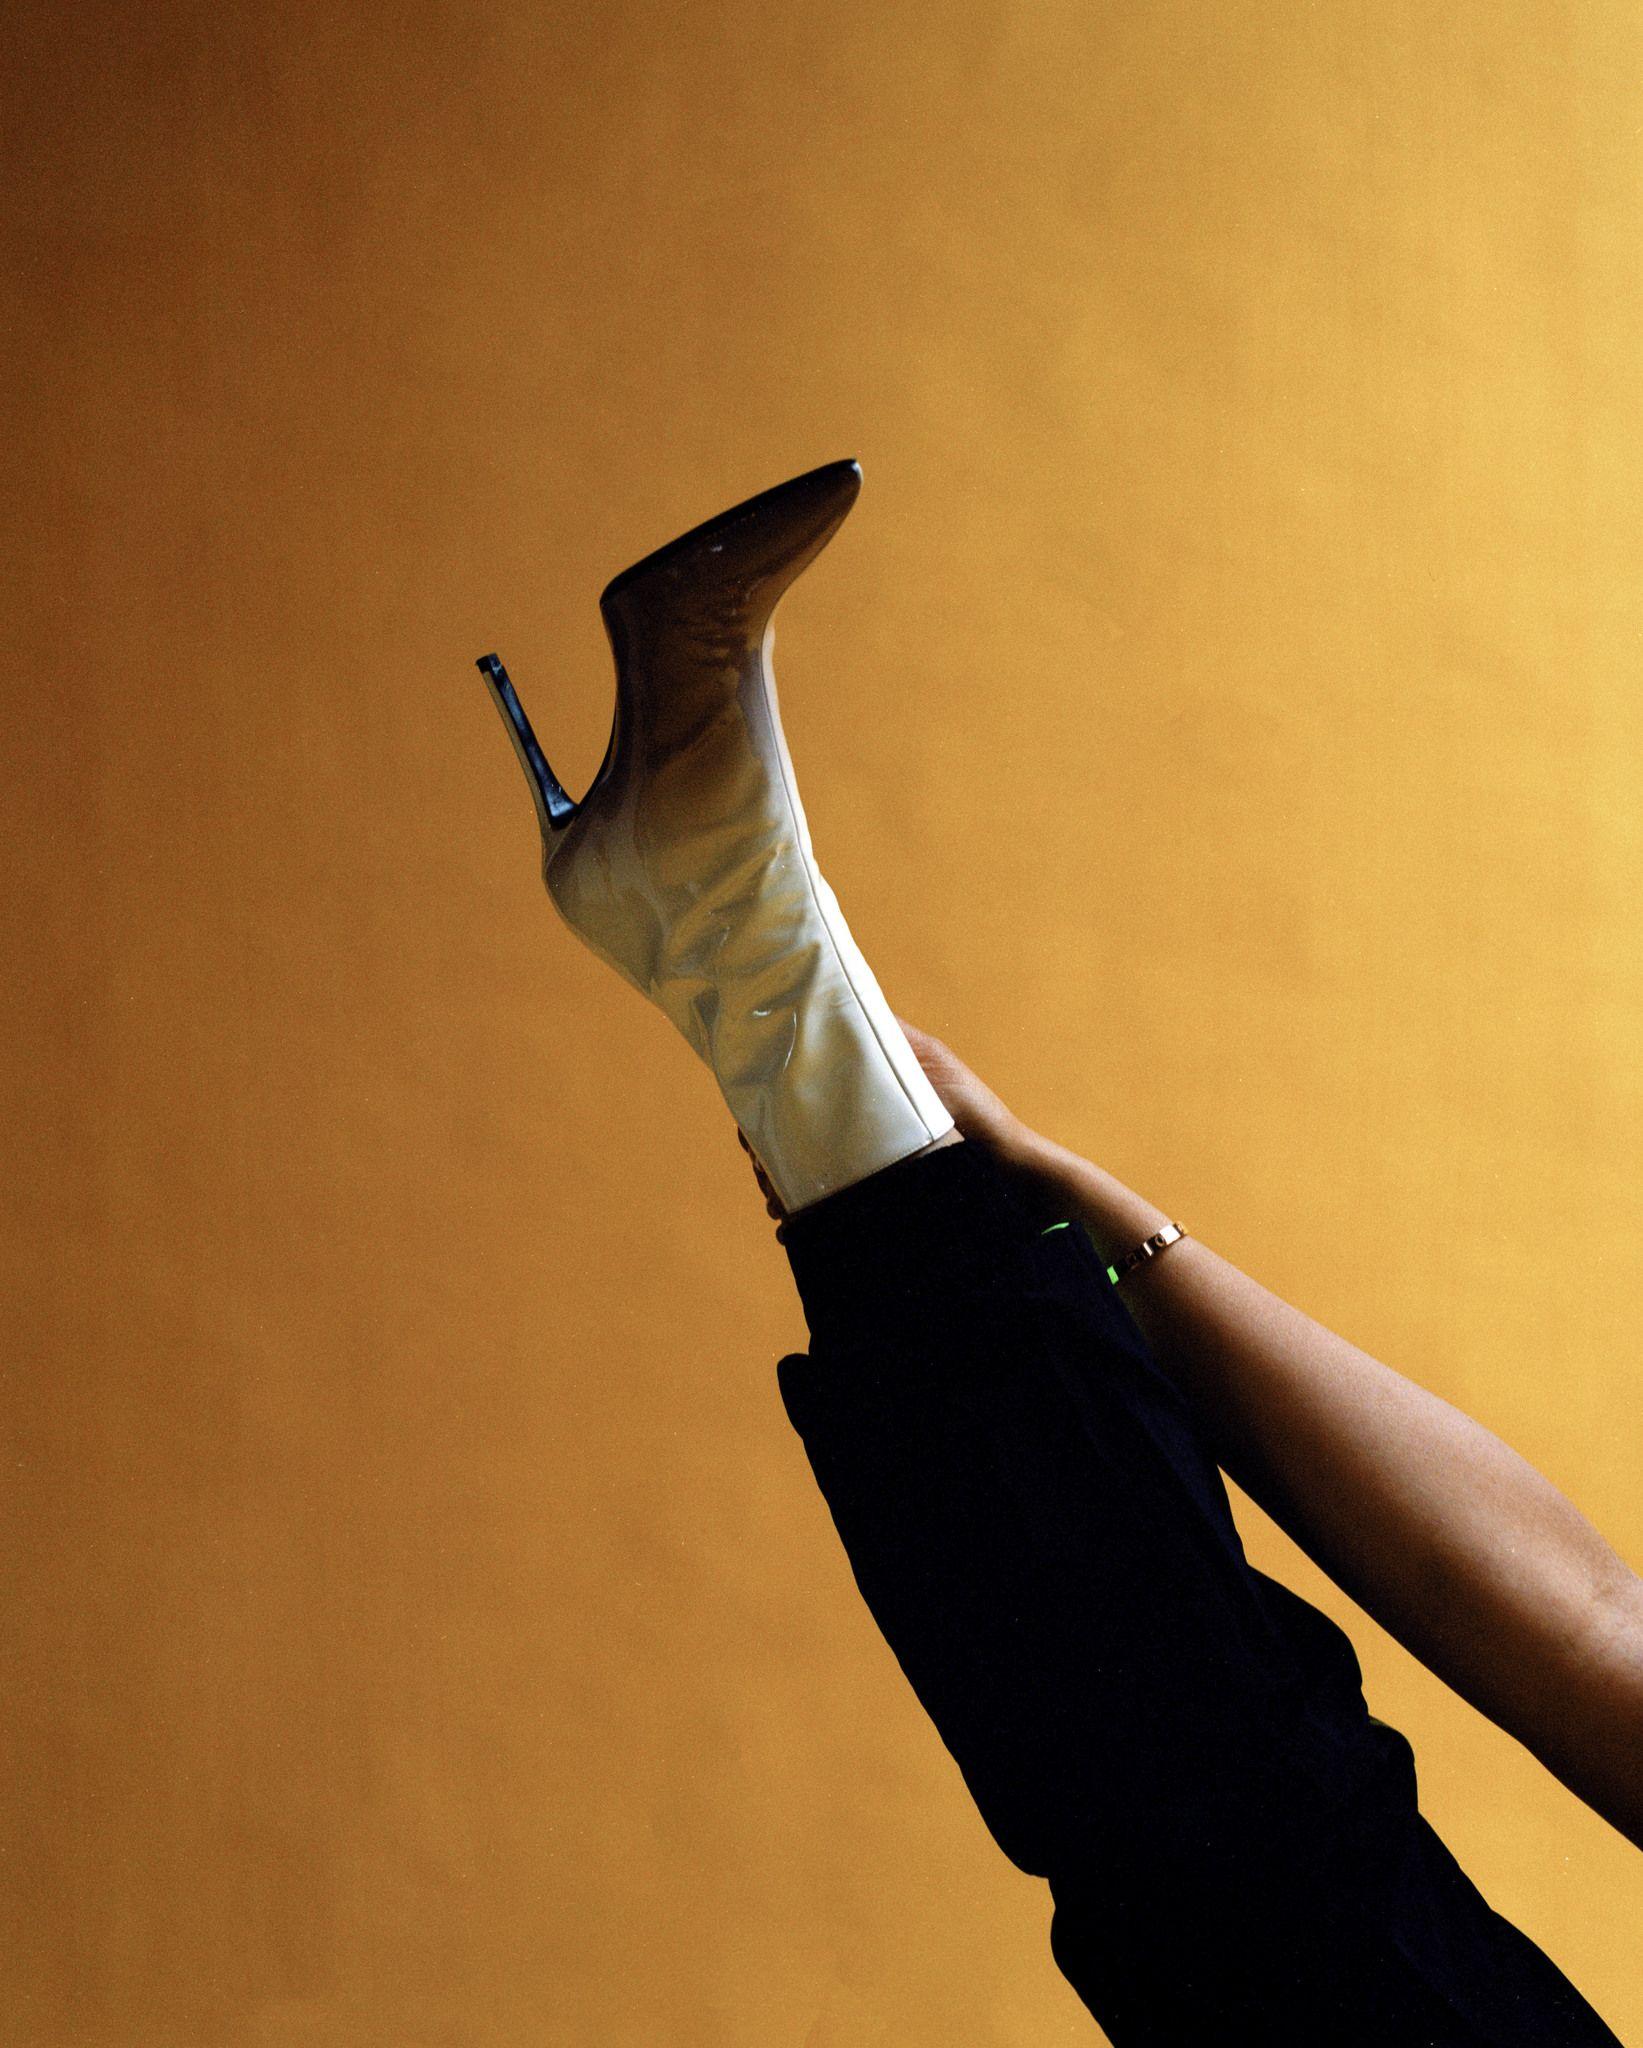 ea55eafad6d BARNEYS NEW YORK X JORDYN WOODS Dégradé Patent Leather Ankle Boots ...